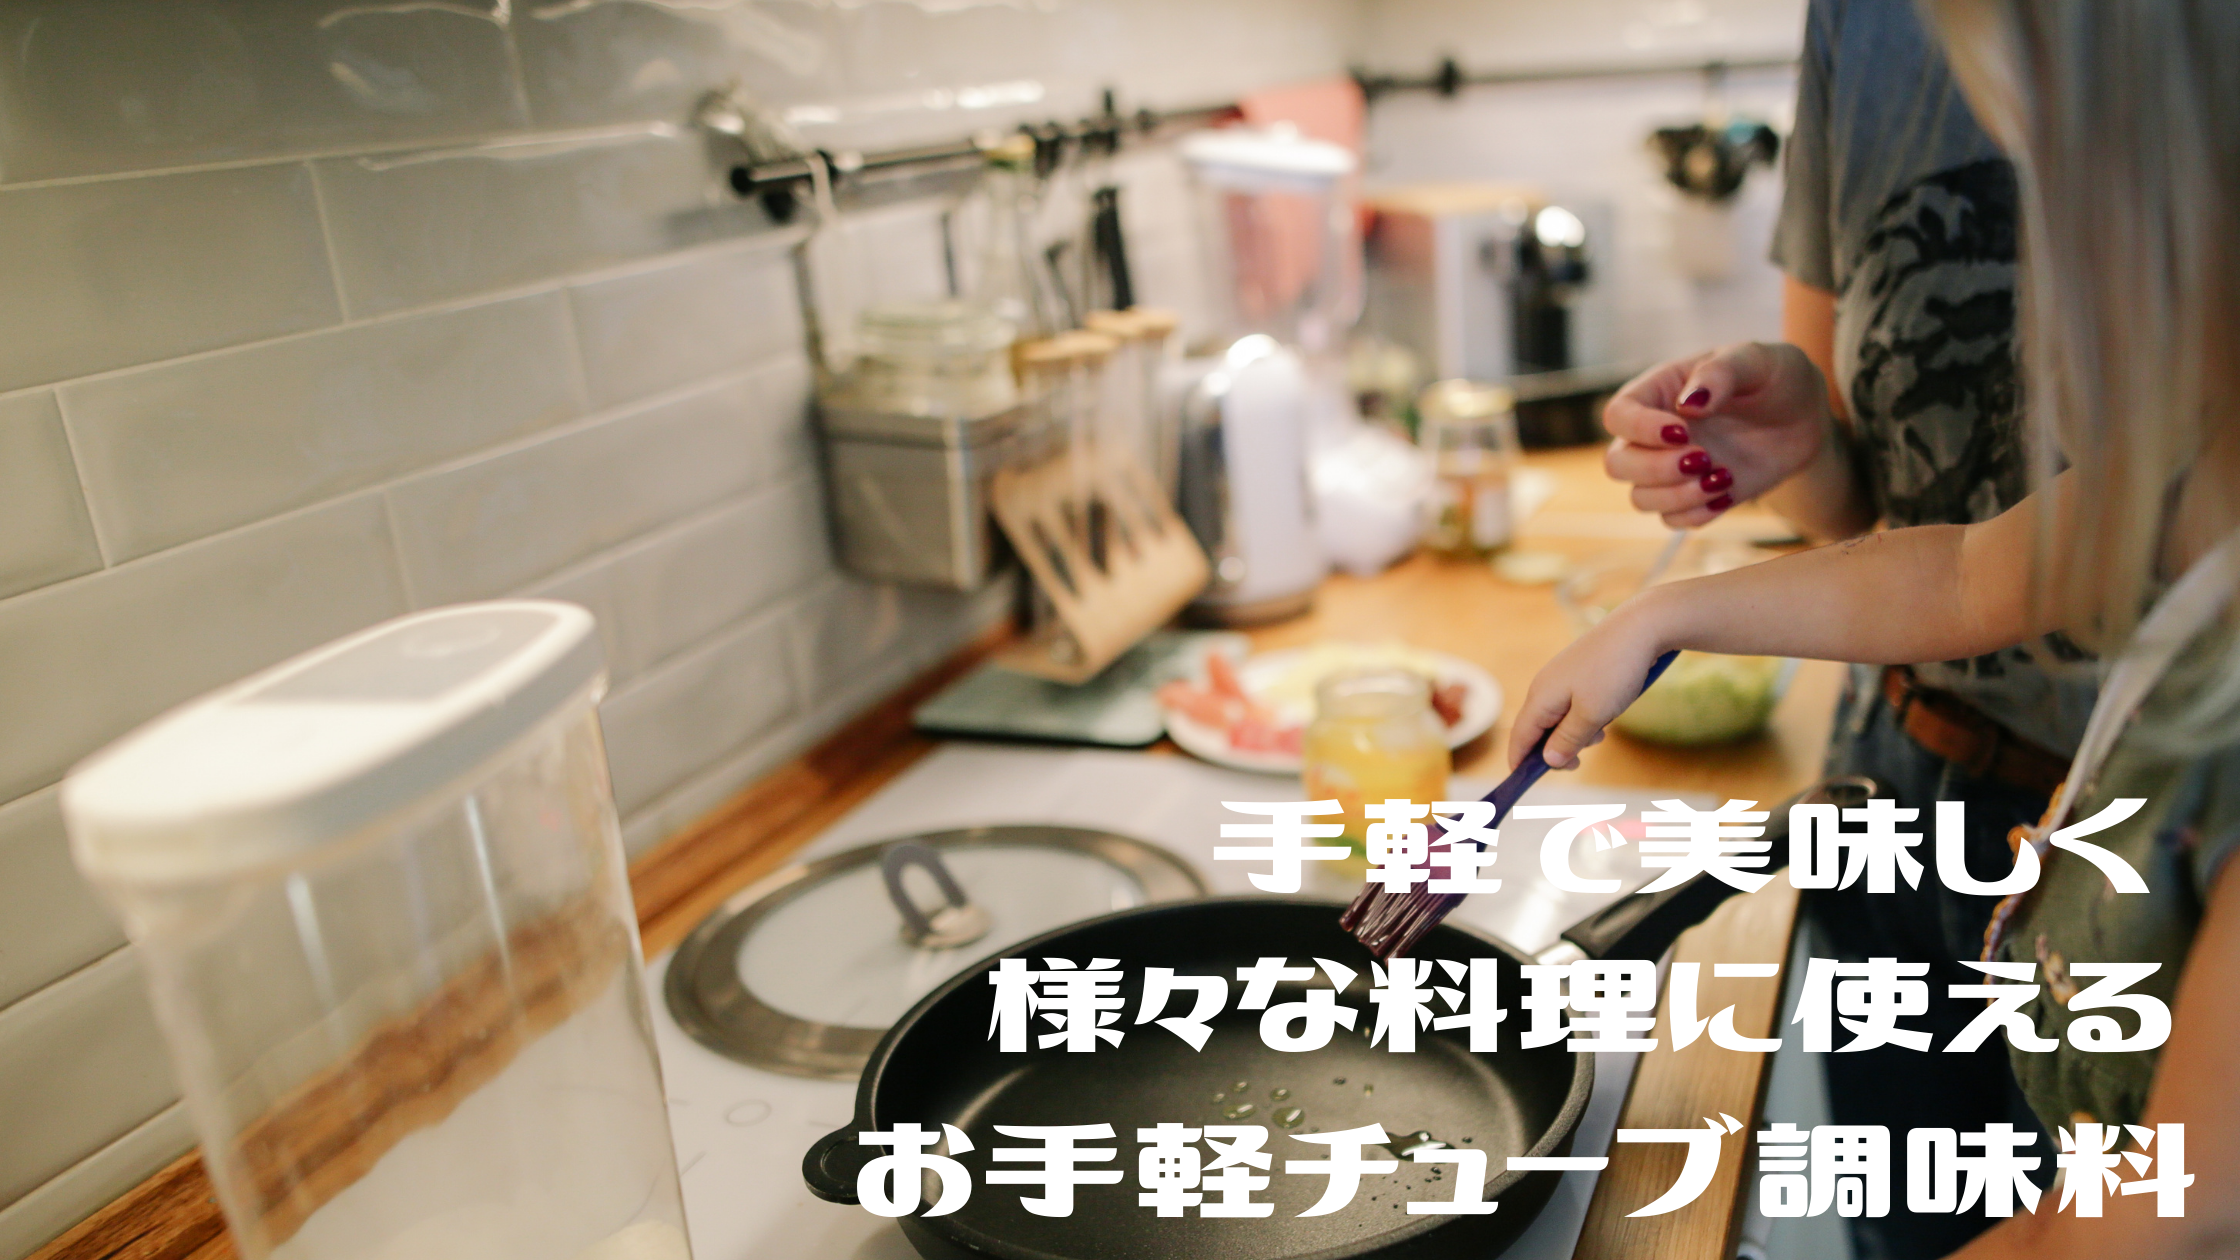 【ZIP】『3つの最強万能調味料』『濃厚 安納芋ペースト』『ザクザクピクルス』【お手軽チューブ調味料】